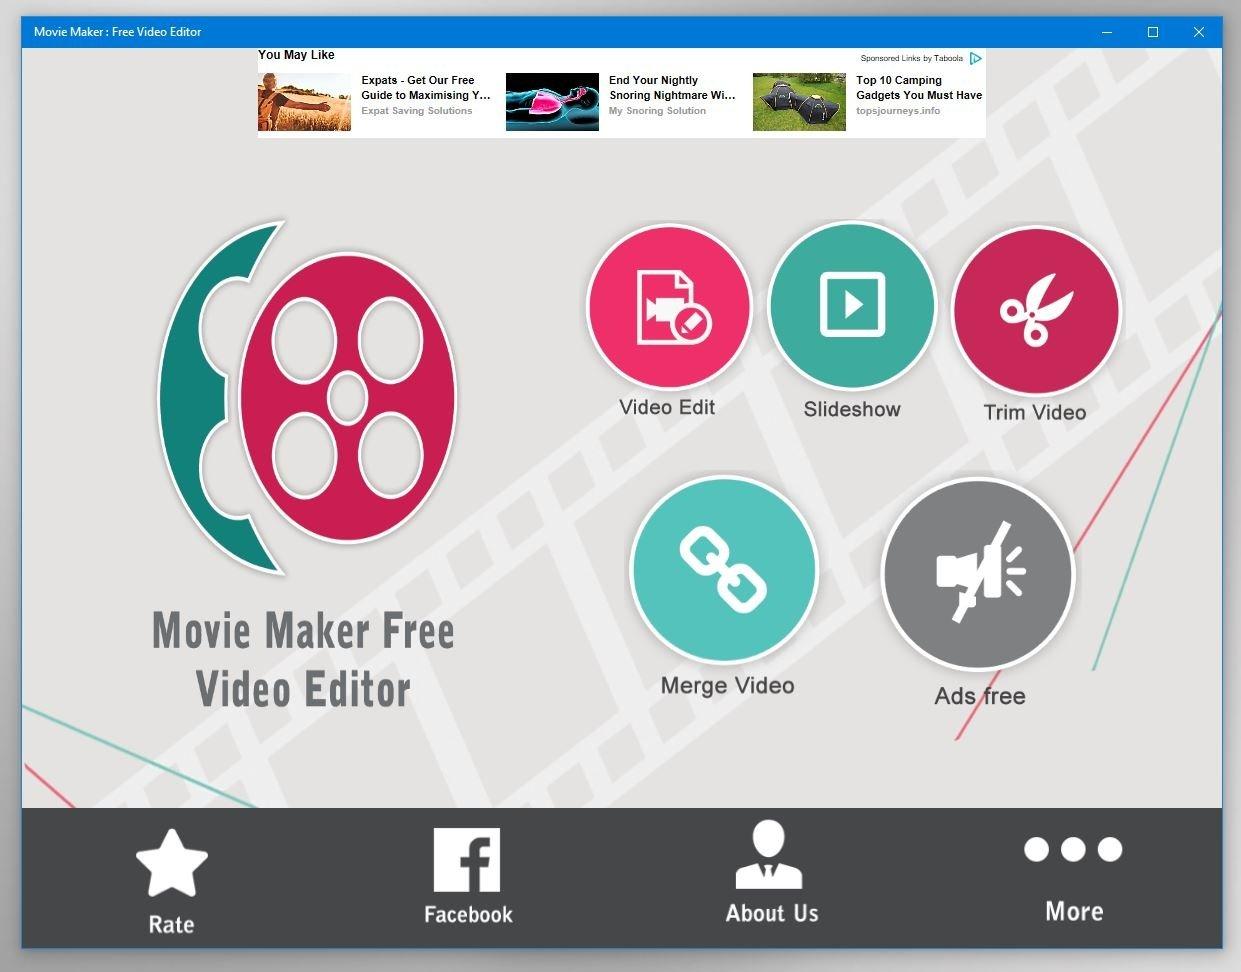 Movie Maker - Free Video Editor image 6